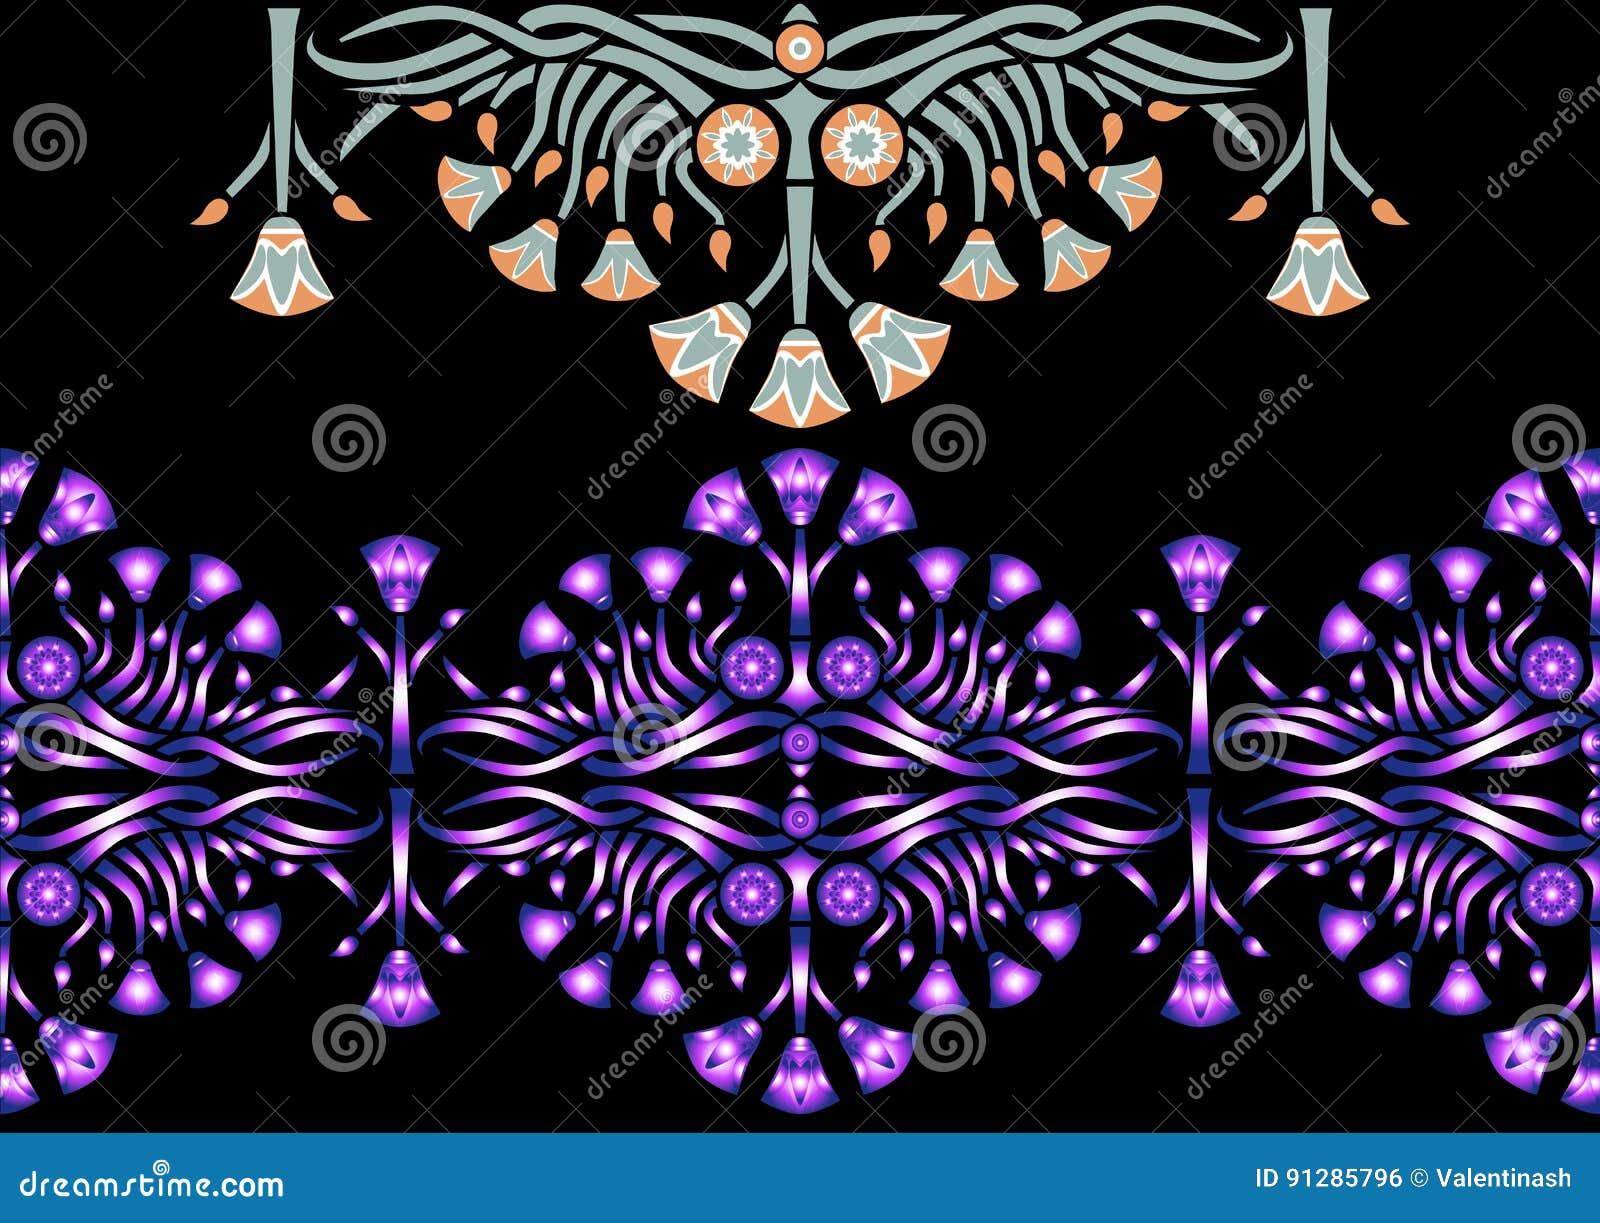 Ancient egyptian pattern with lotus stock vector illustration of ancient egyptian pattern with lotus izmirmasajfo